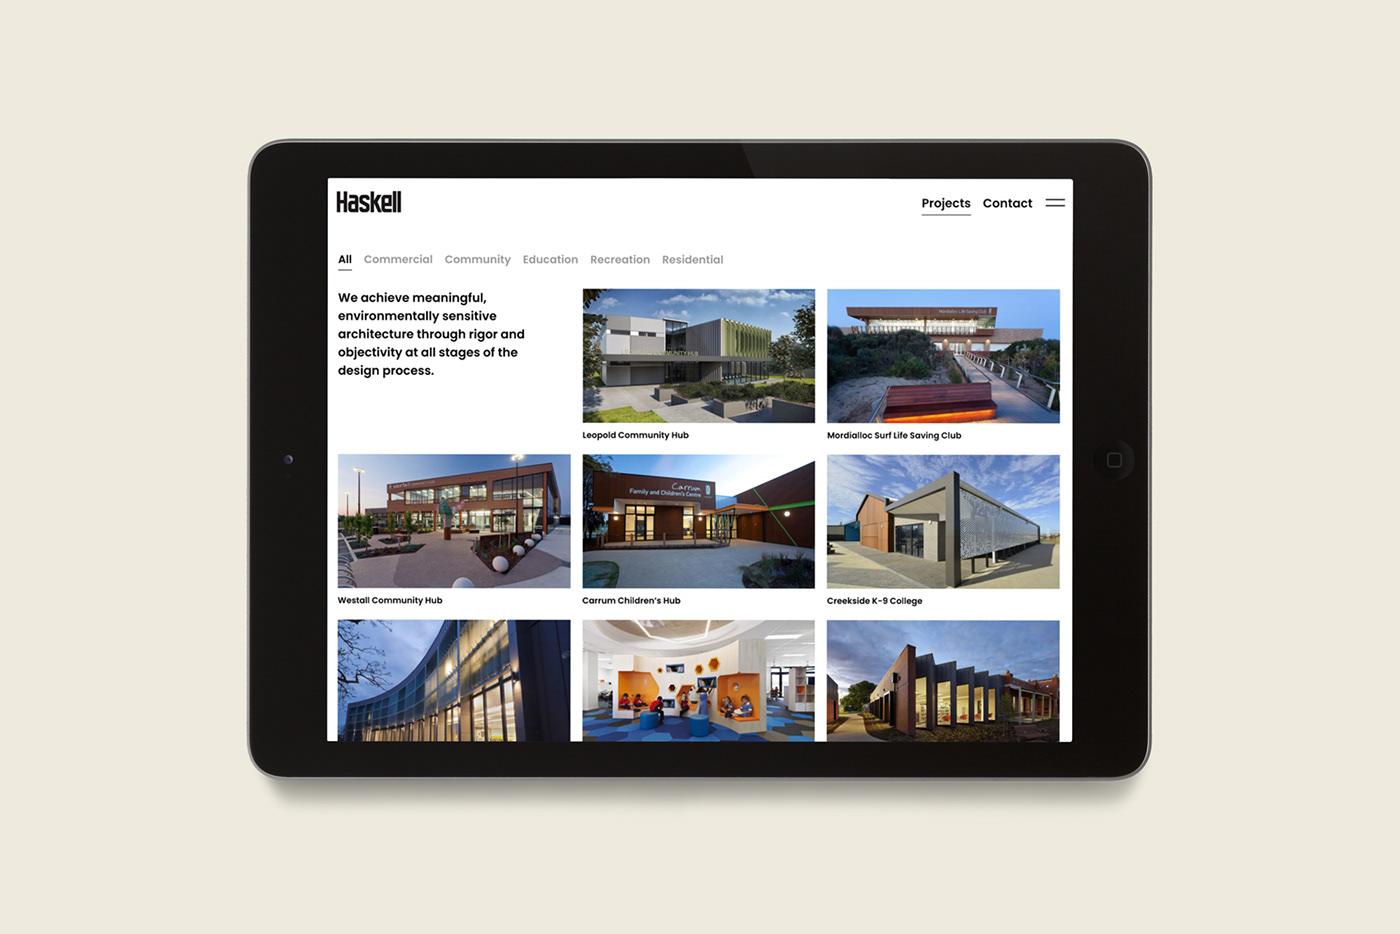 digitaldesign uidesign uxdesign informationdesign design Webdesign digitalidentity